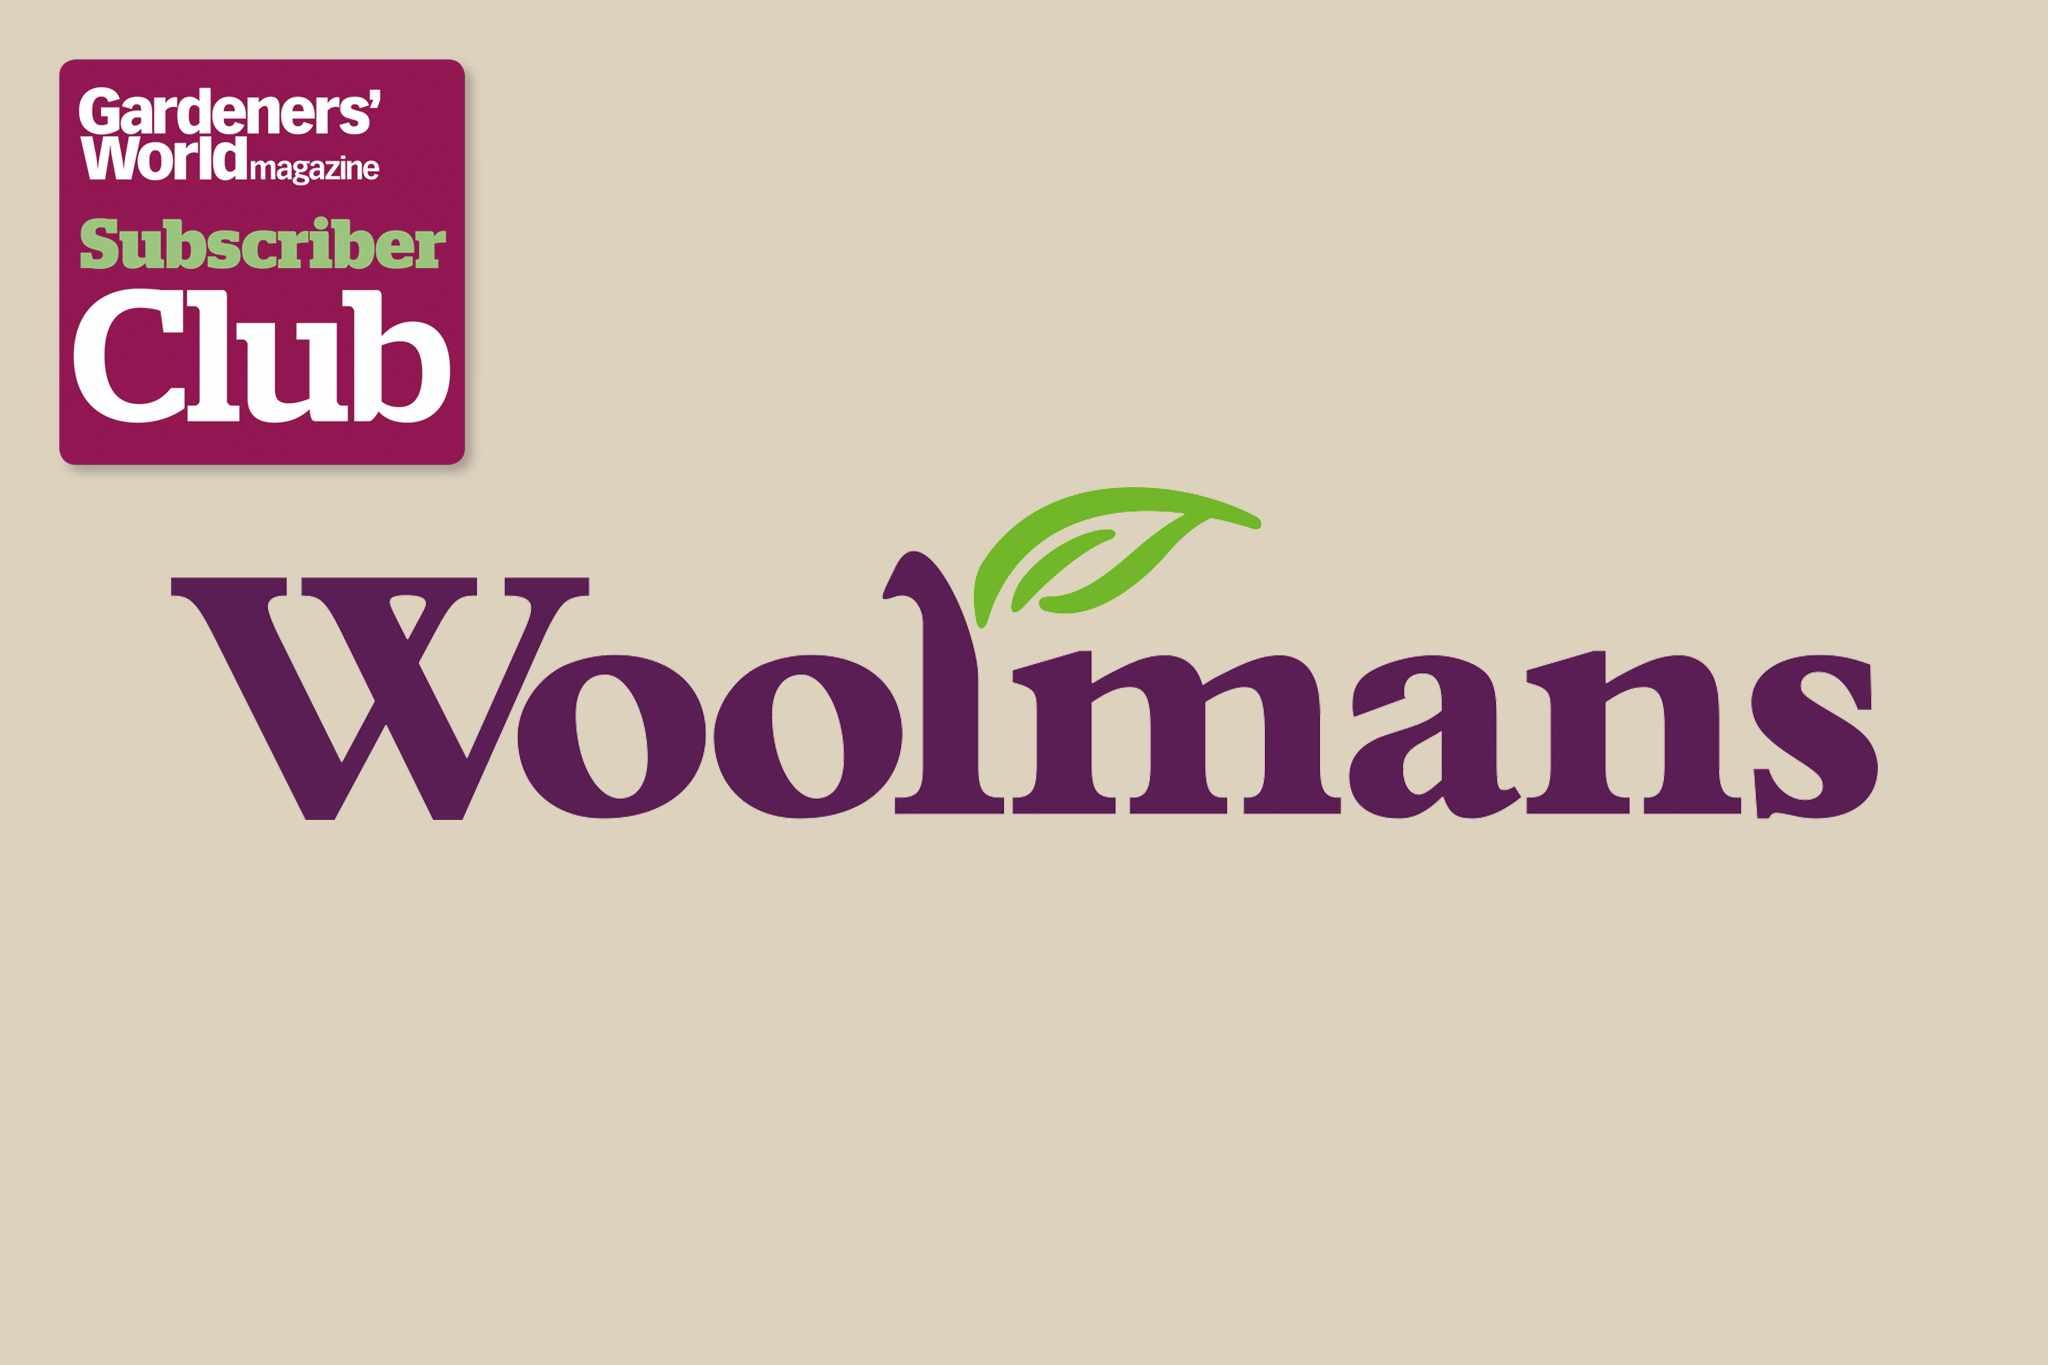 2048x1365-subscriber-club-10-per-cent-woolmans-new